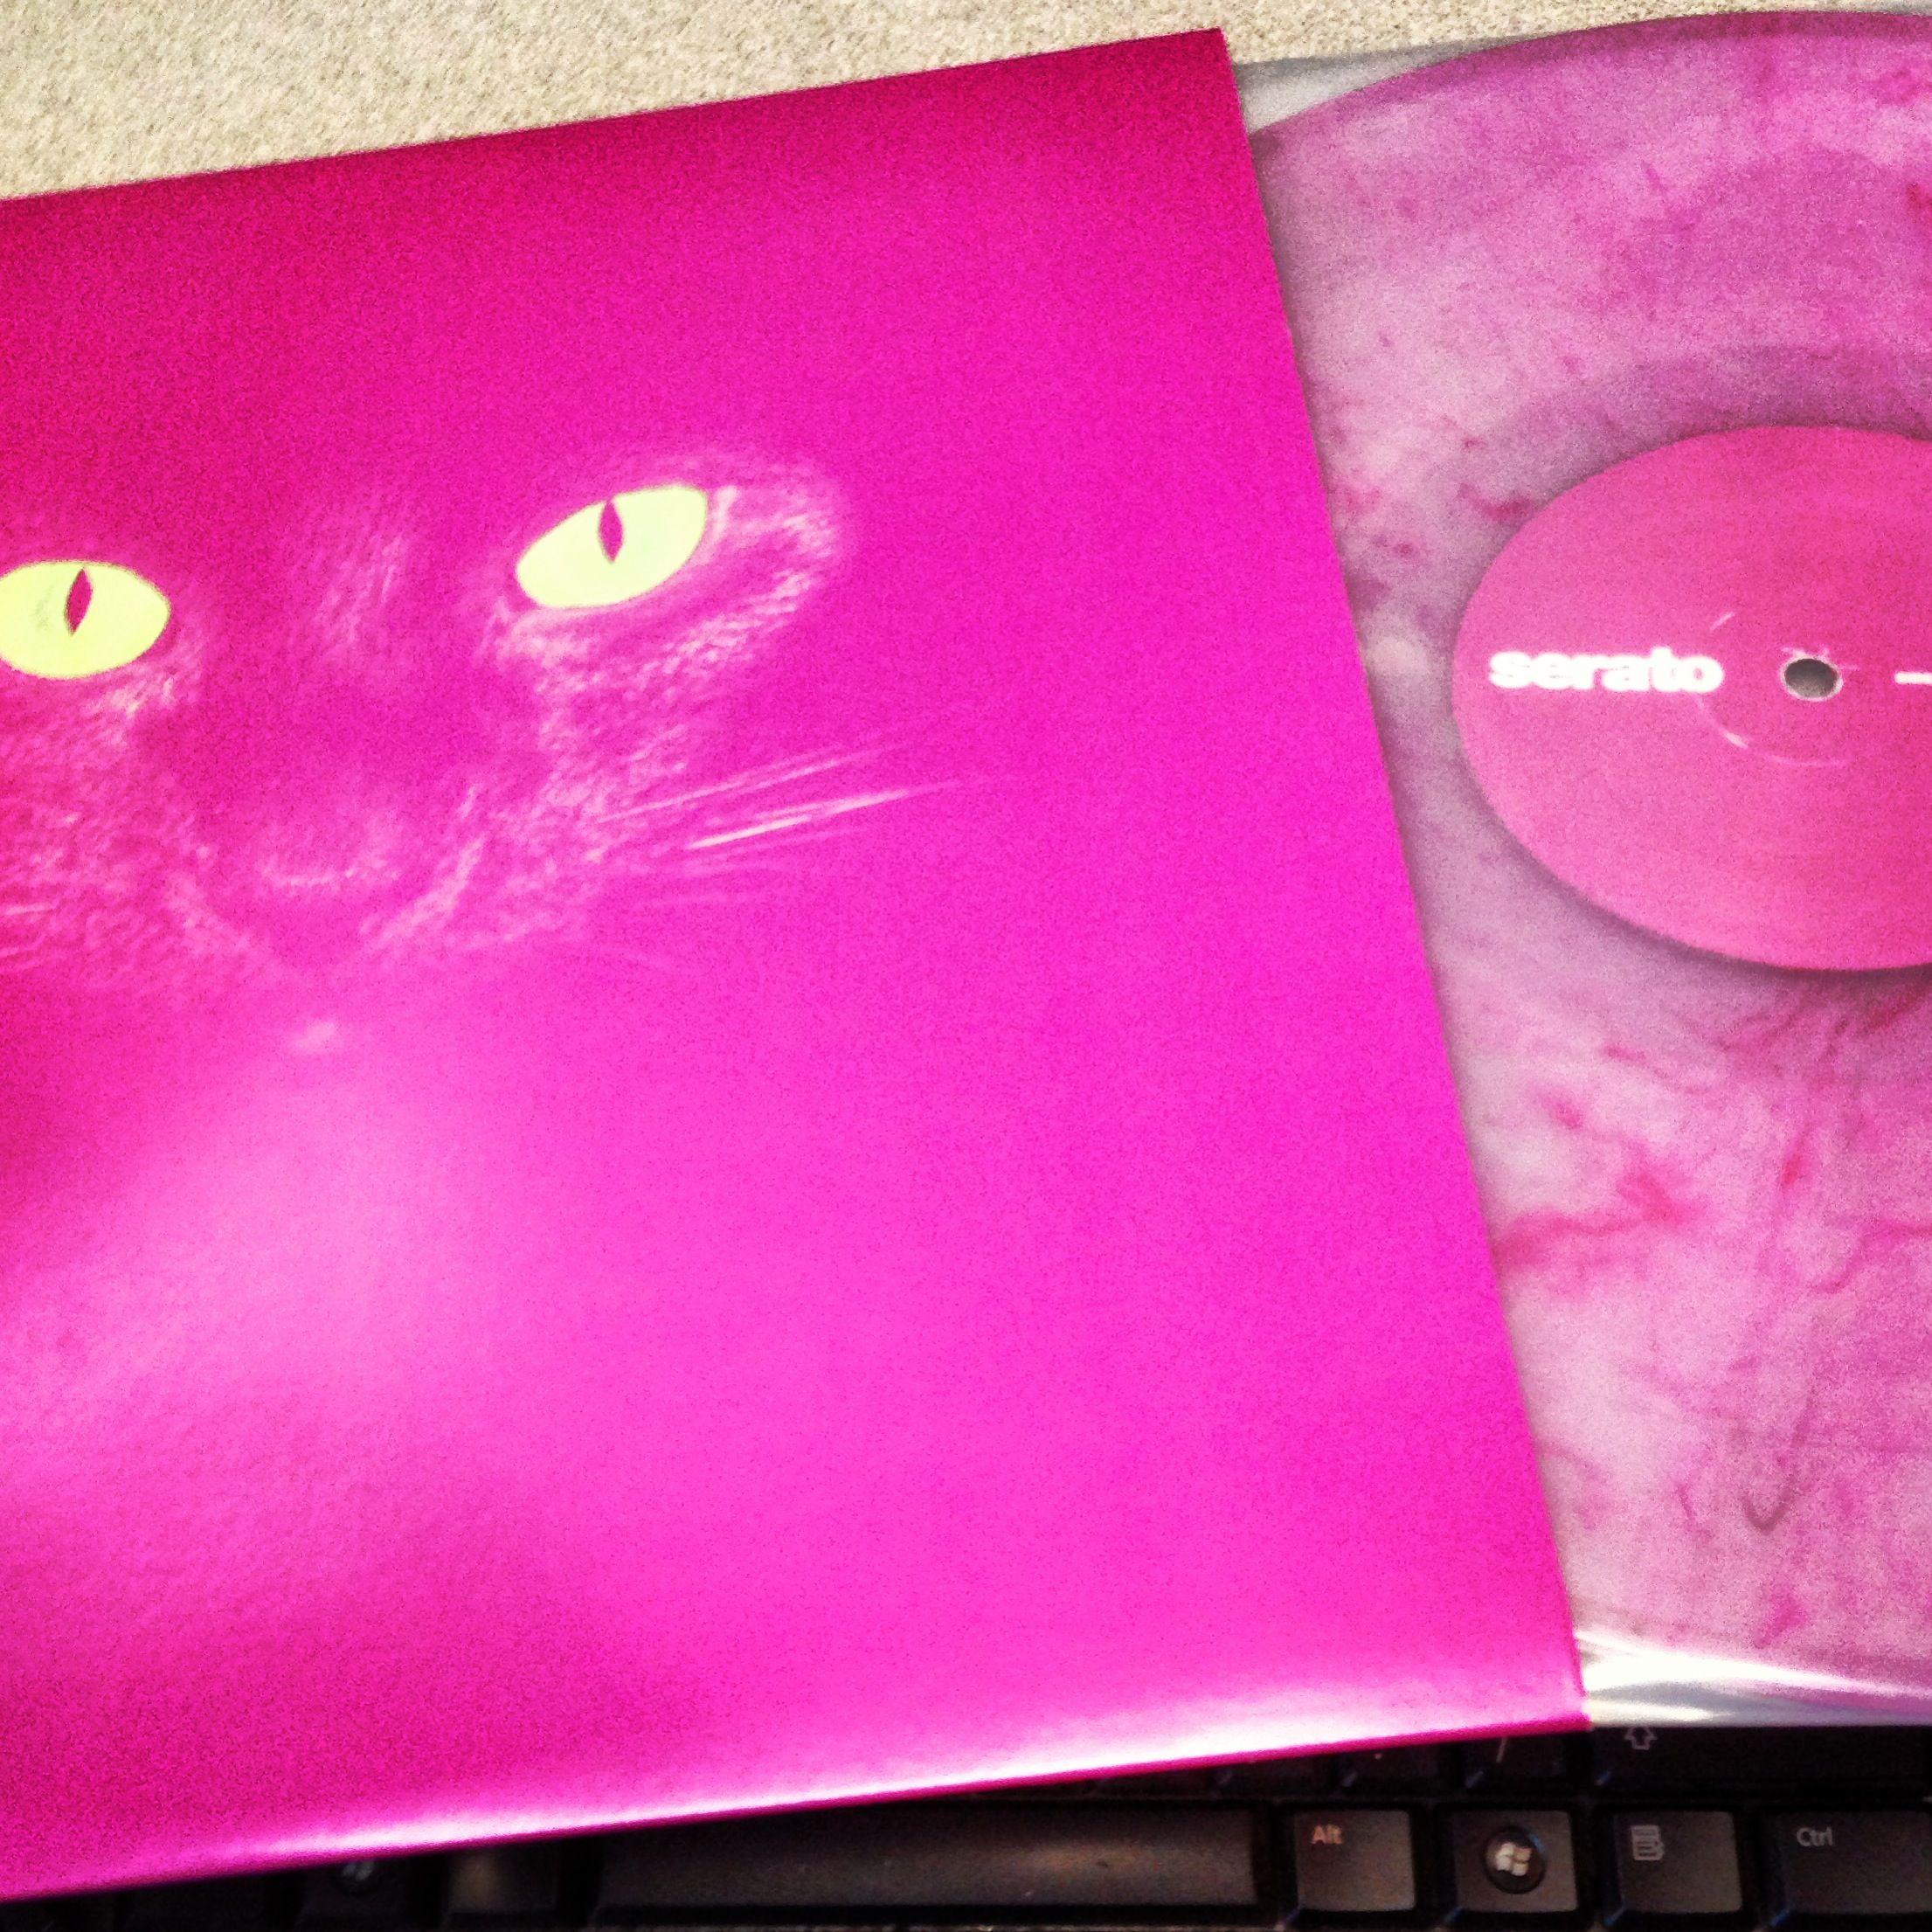 Serato Glow In The Dark Marble Vinyl Album Design Marble Vinyl Dj Gear